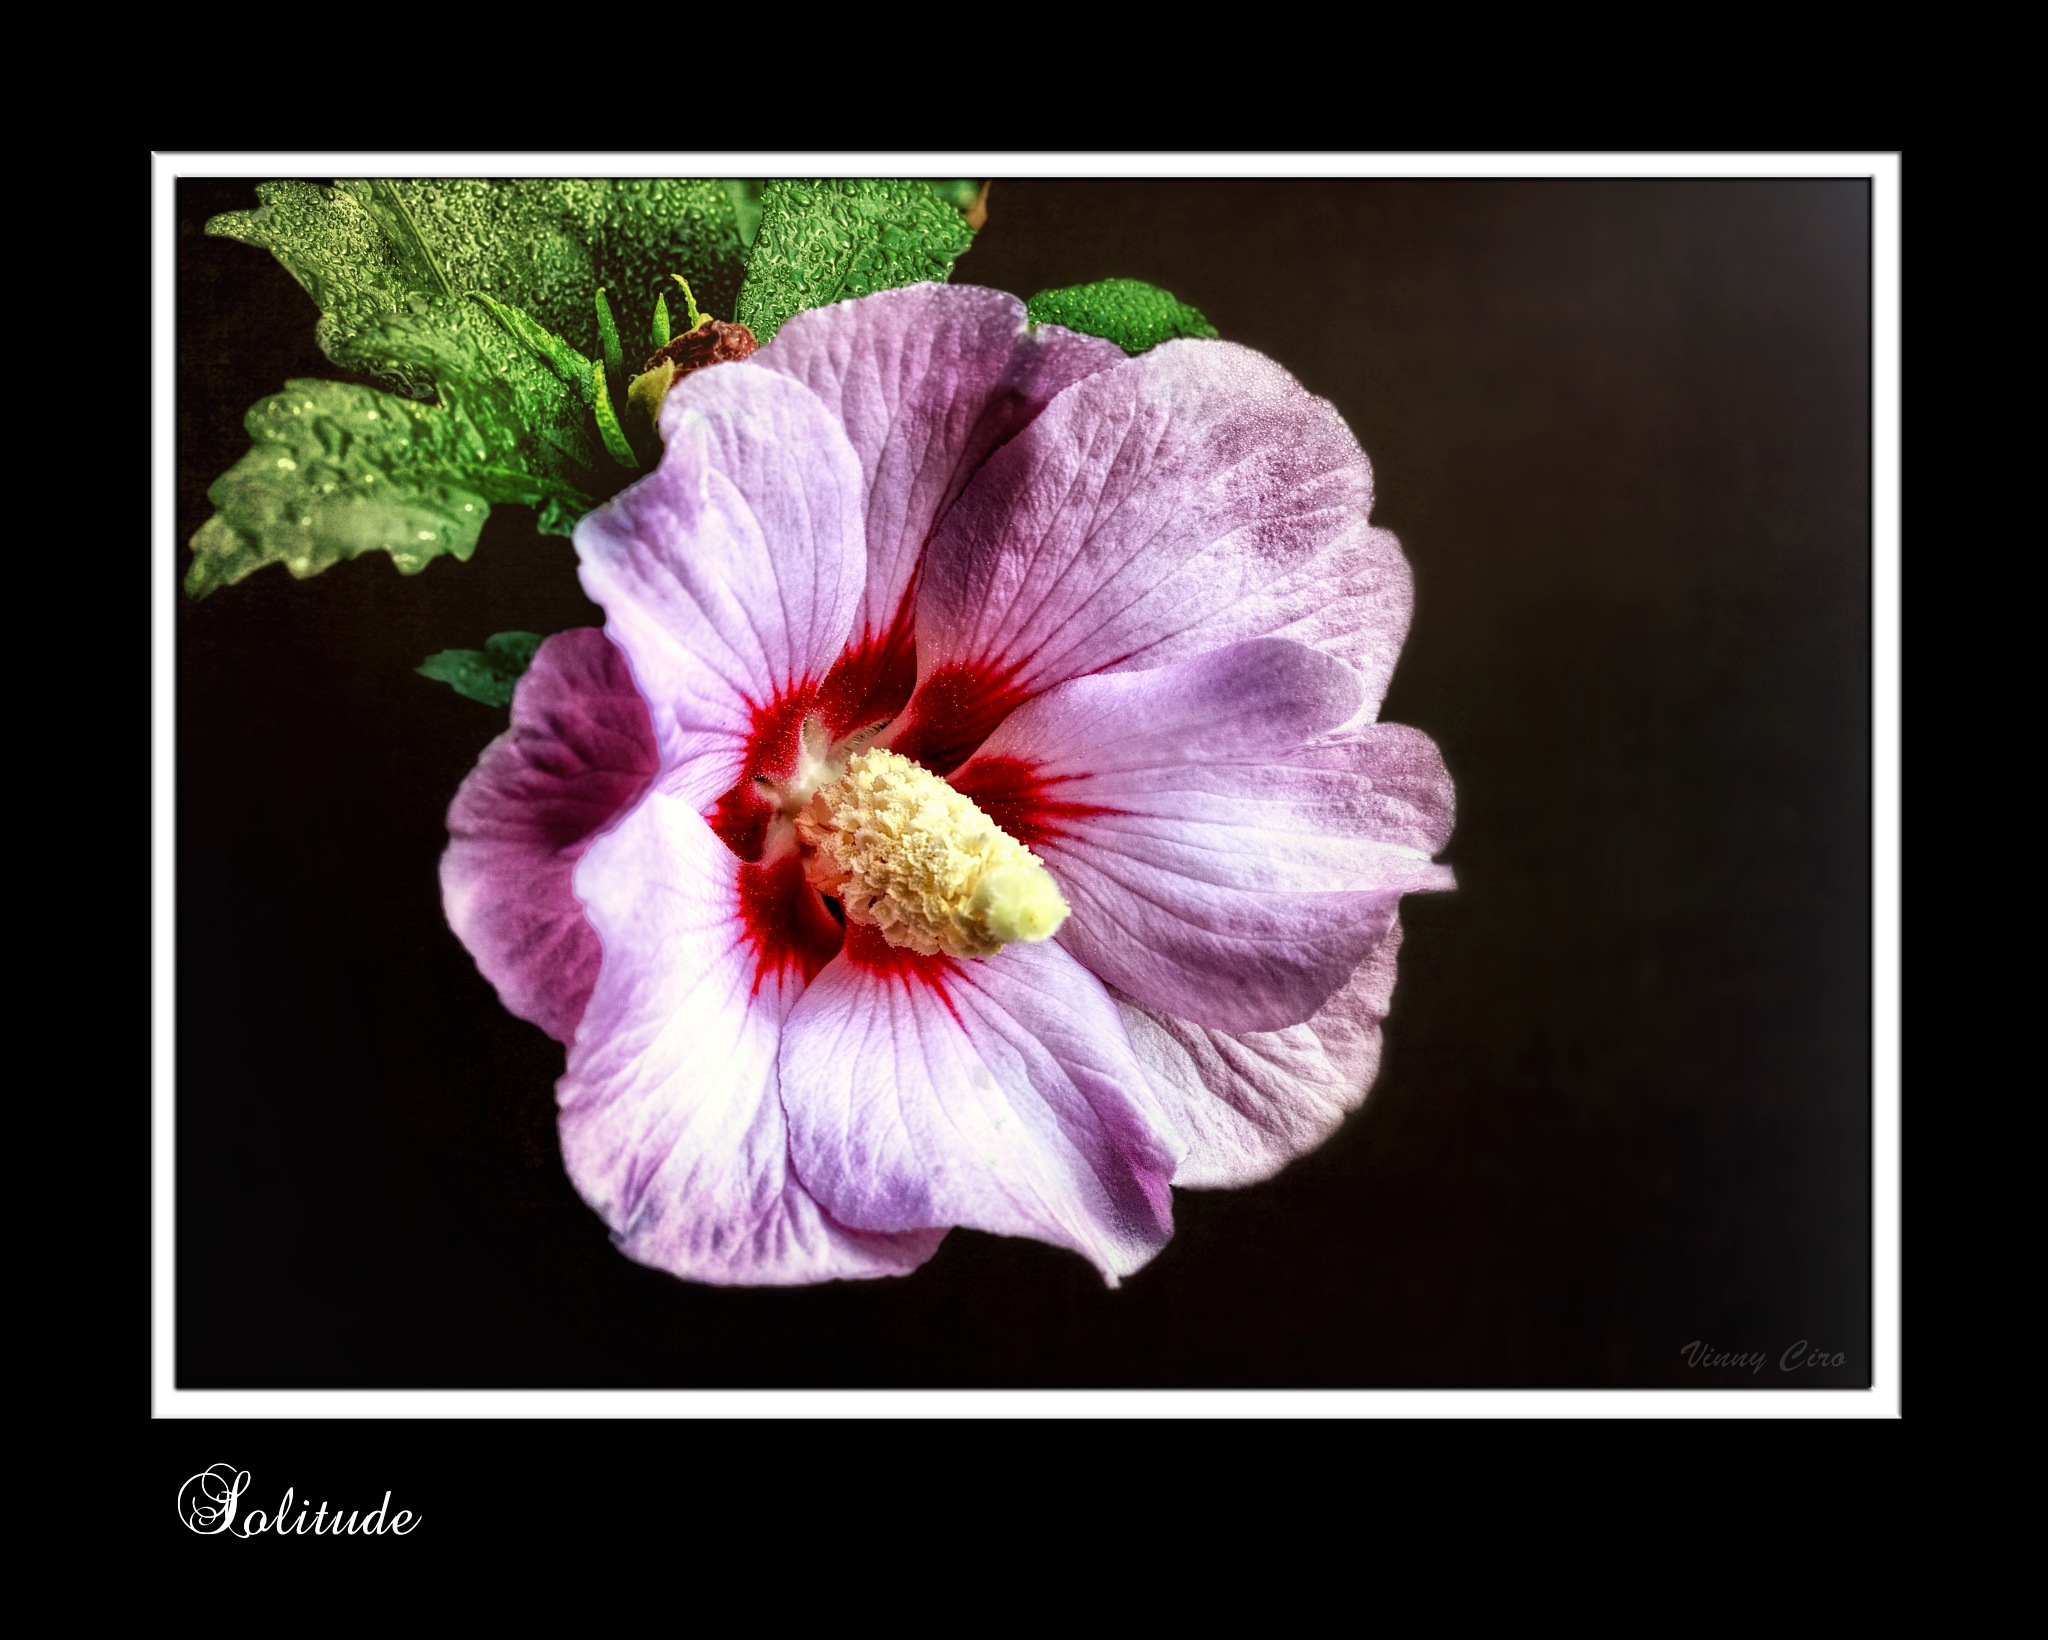 Solitude by vpciro